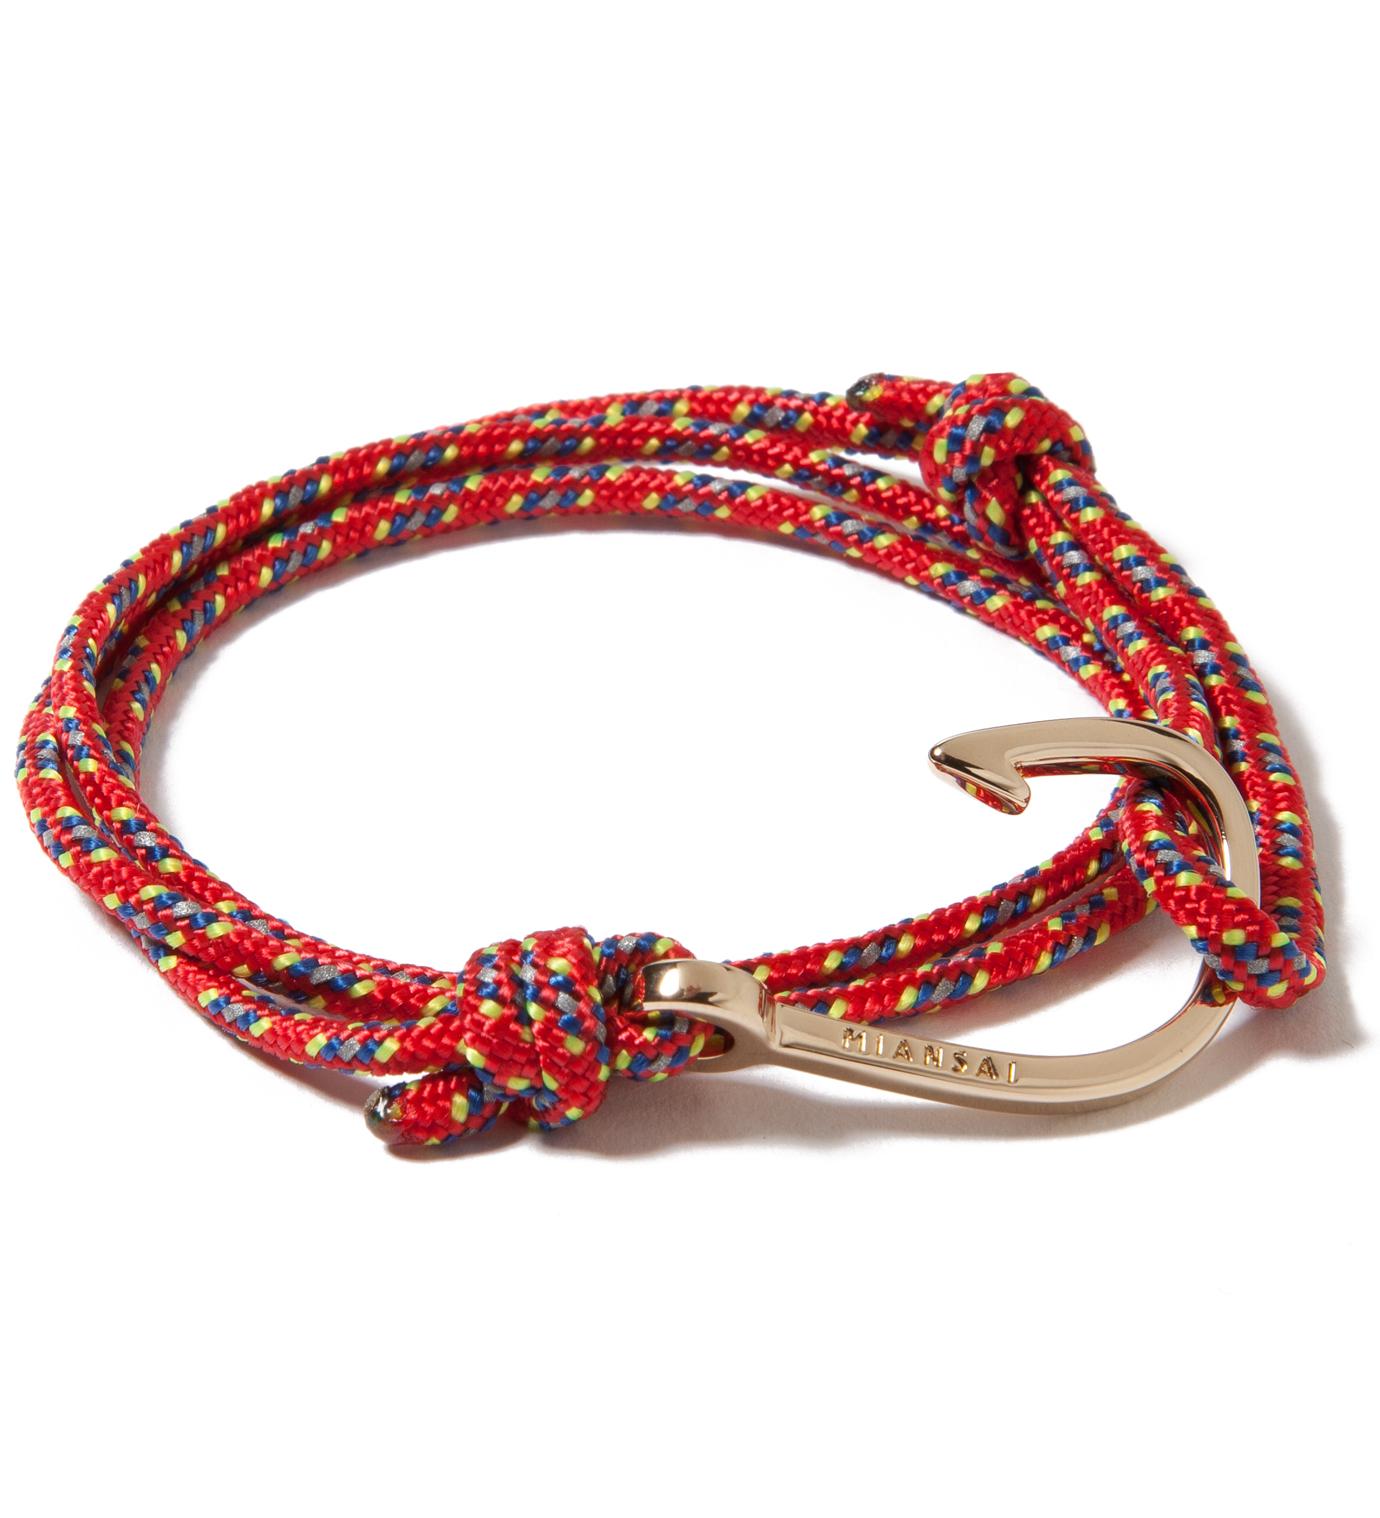 Miansai Gold Hook on Red Rope Bracelet